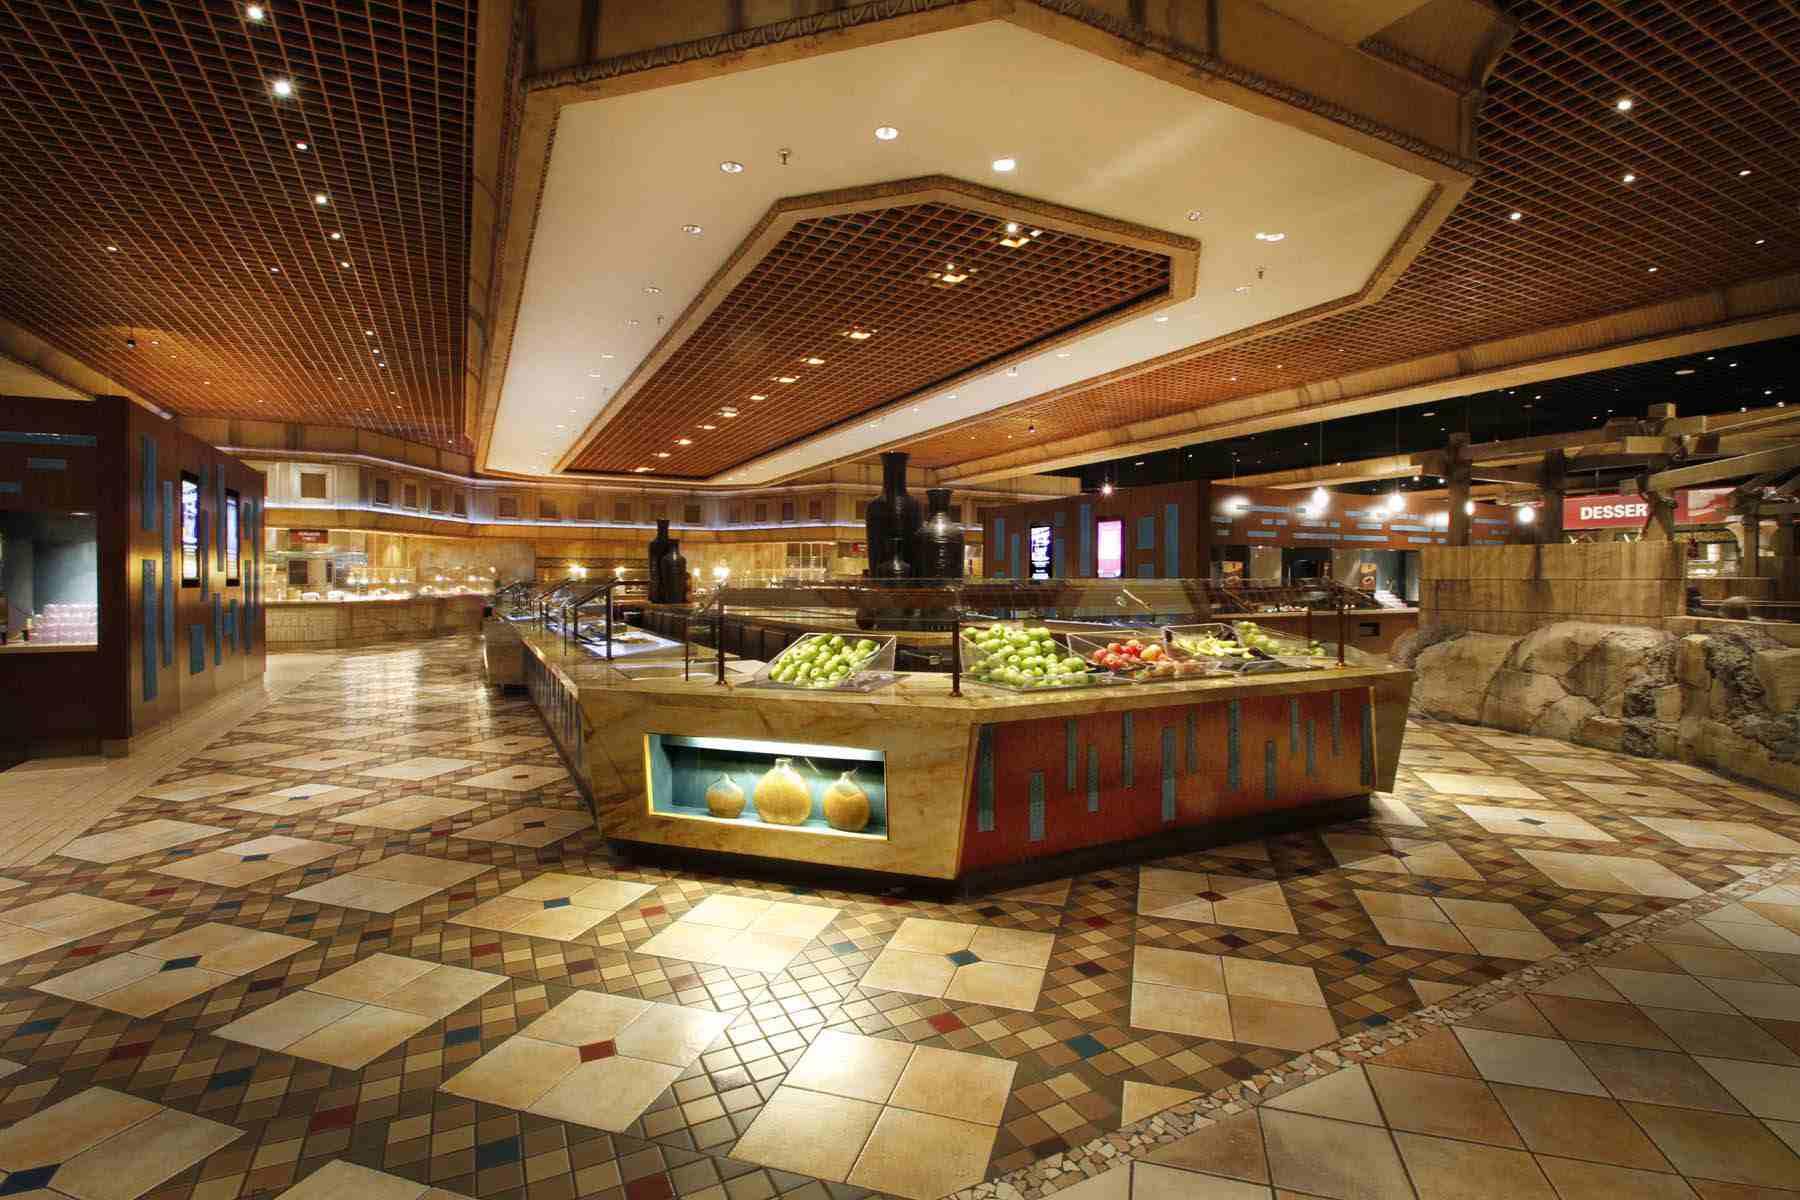 Luxor Las Vegas Restaurants: The Complete Guide